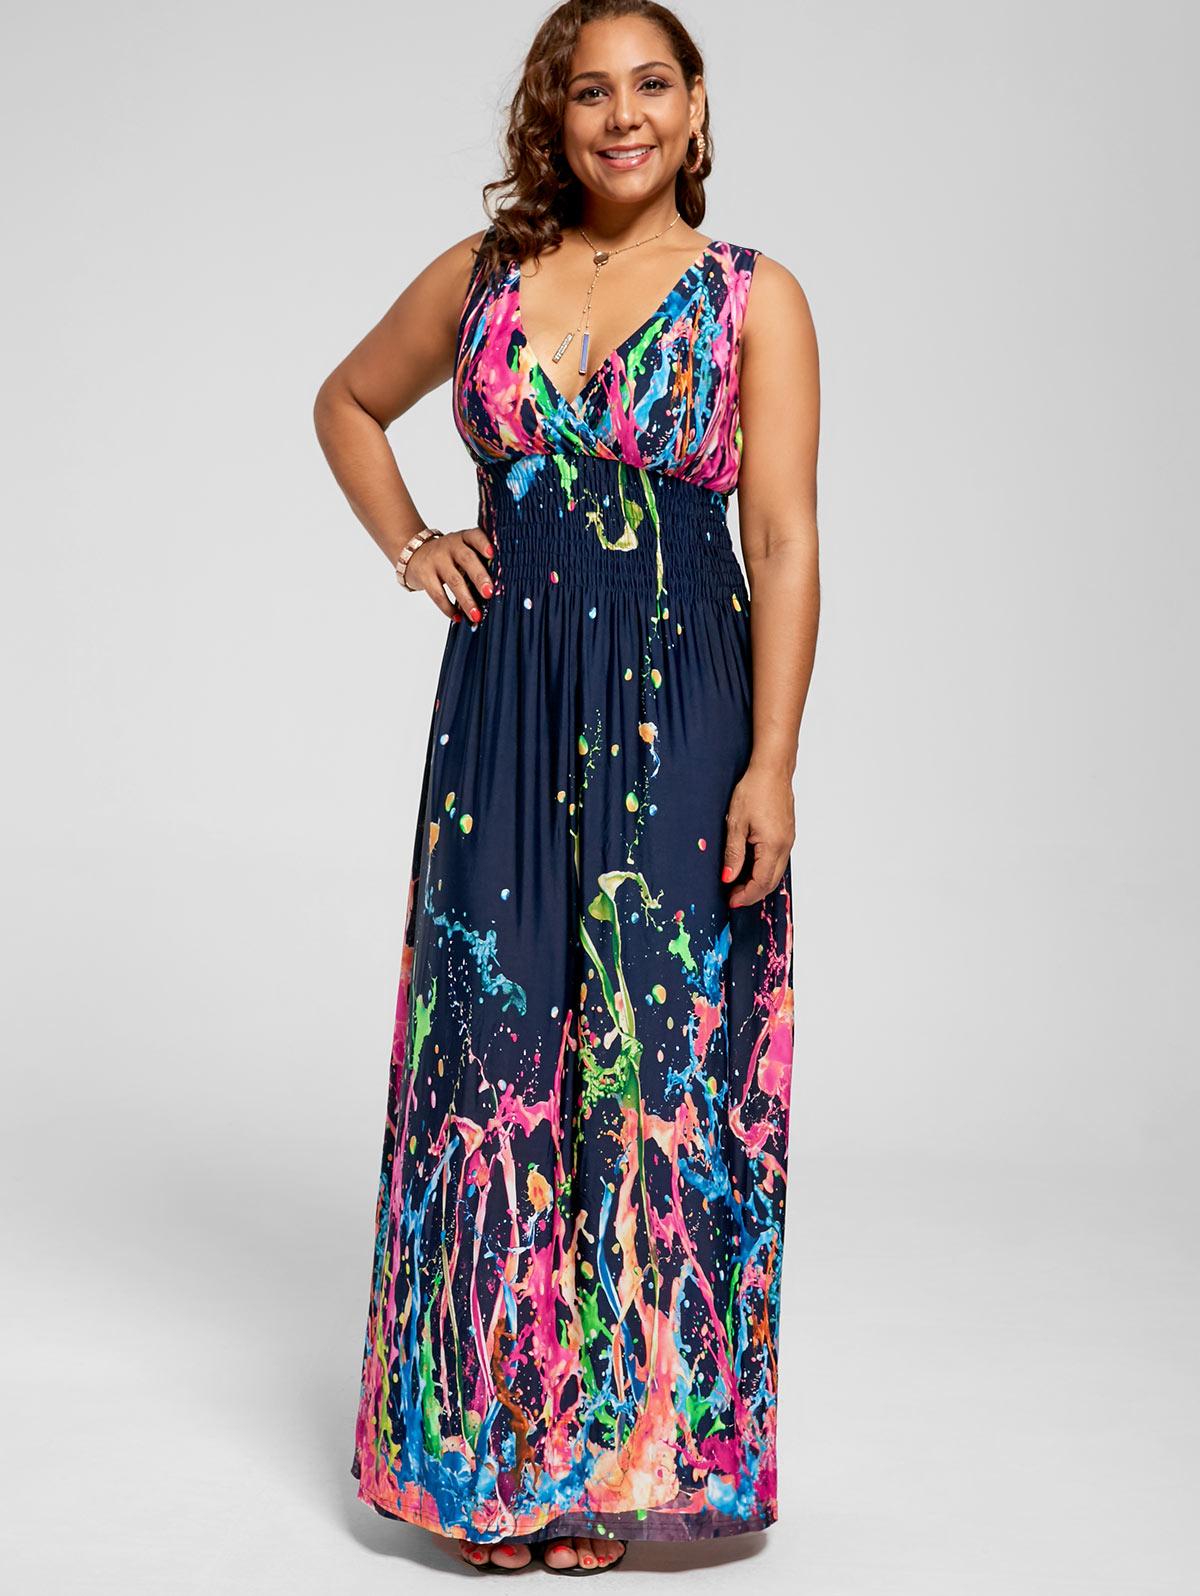 02b31ebf6c8 Empire Waist Casual Dresses Plus Size - Gomes Weine AG